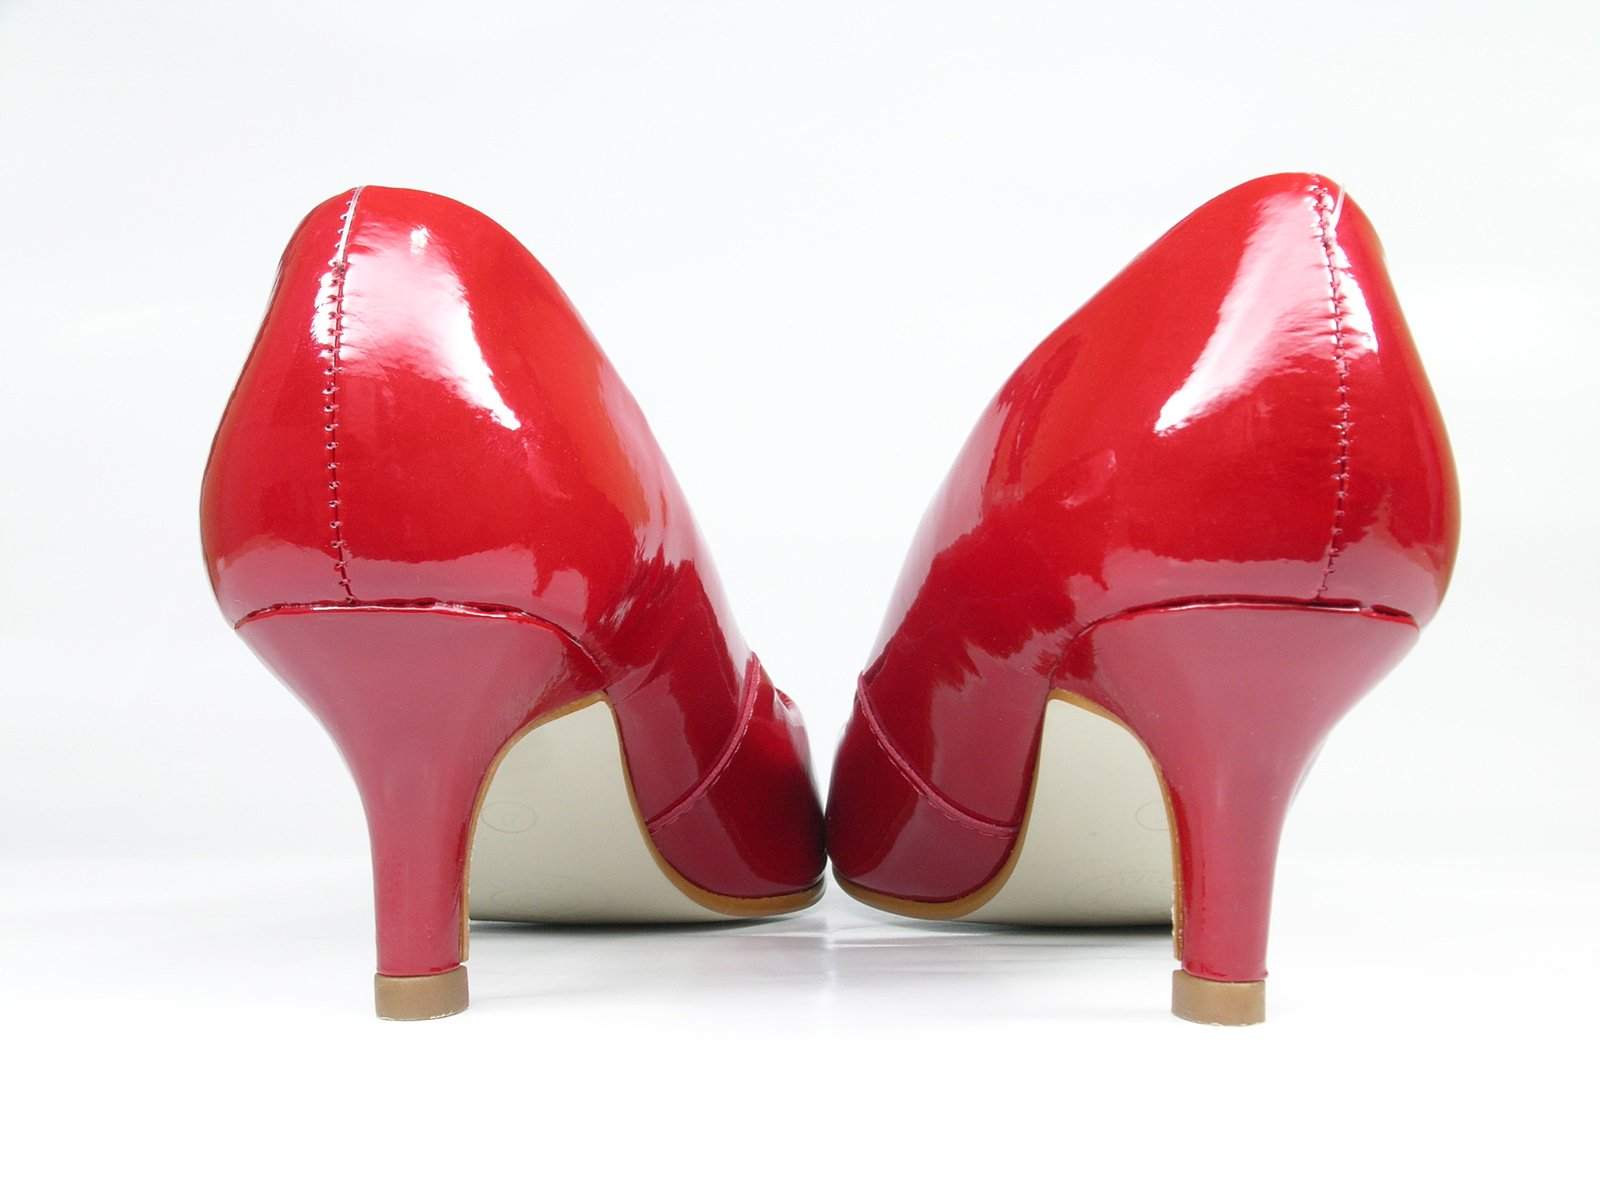 4fa95714ecb54 Free Rote Schuhe Heels 2 Stock Photo - FreeImages.com